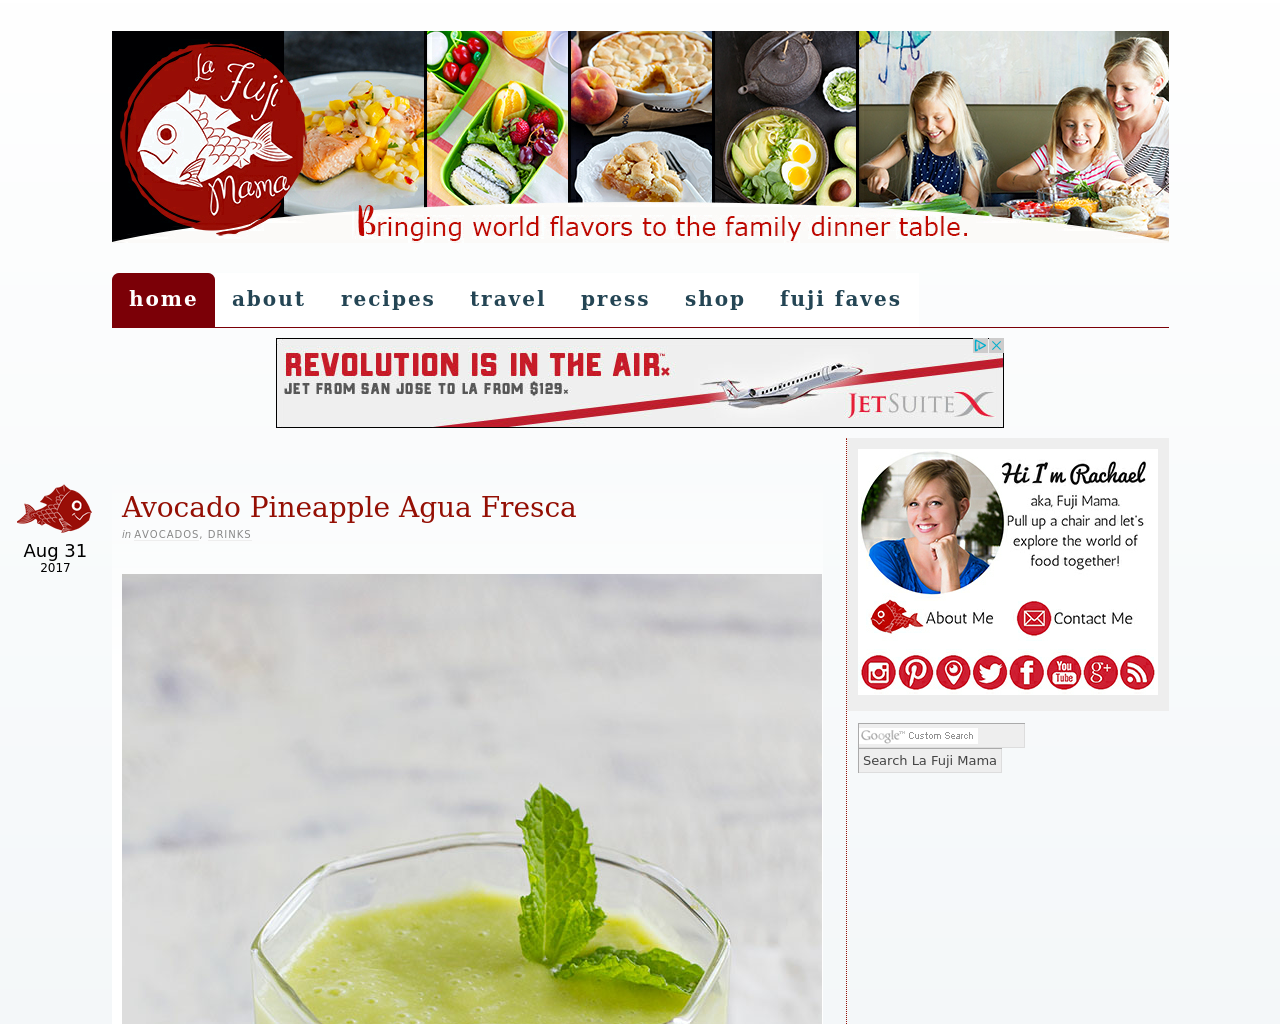 La-Fuji-Mama-Advertising-Reviews-Pricing